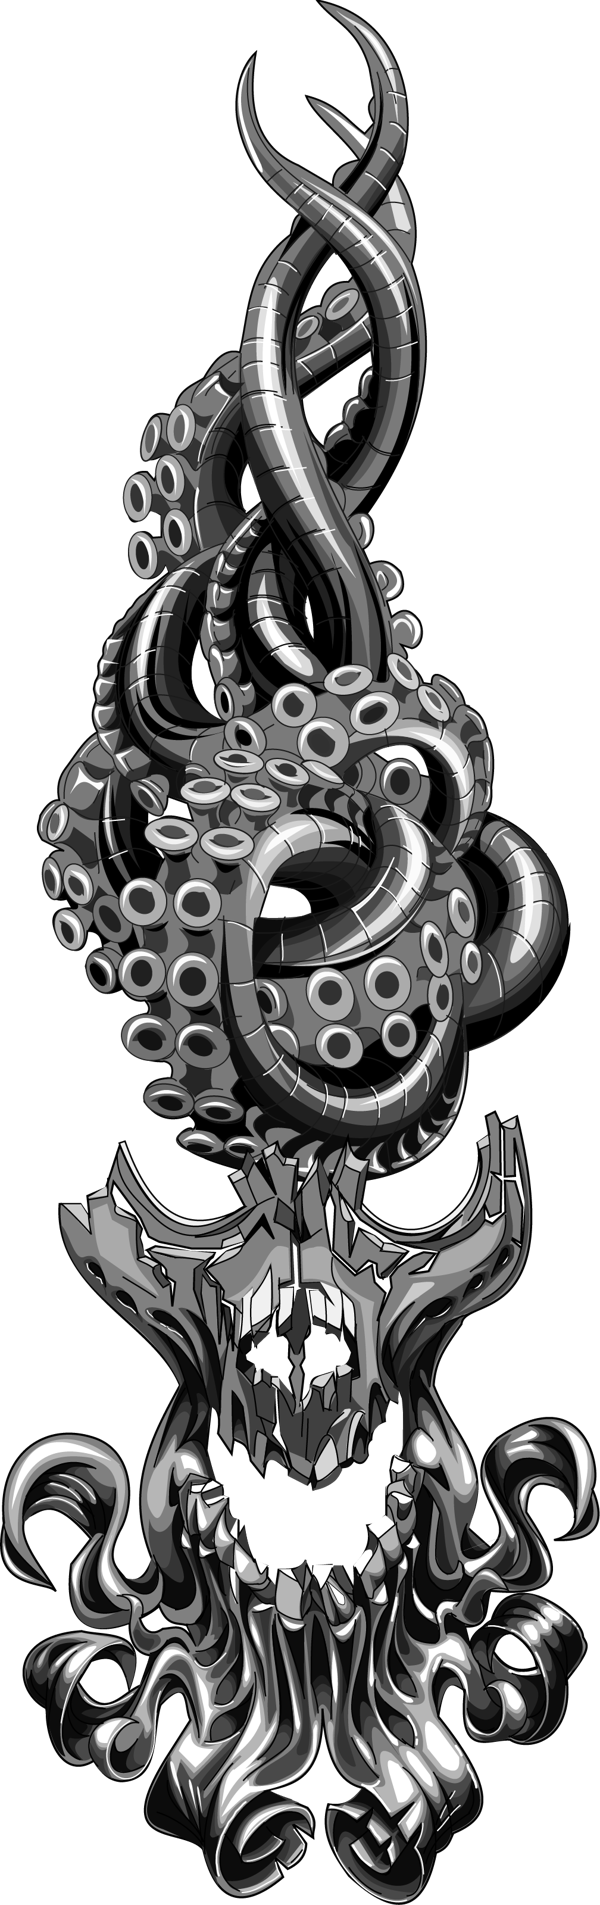 skull octopus flame area code on behance inspiration pinterest behance skulls and area codes. Black Bedroom Furniture Sets. Home Design Ideas